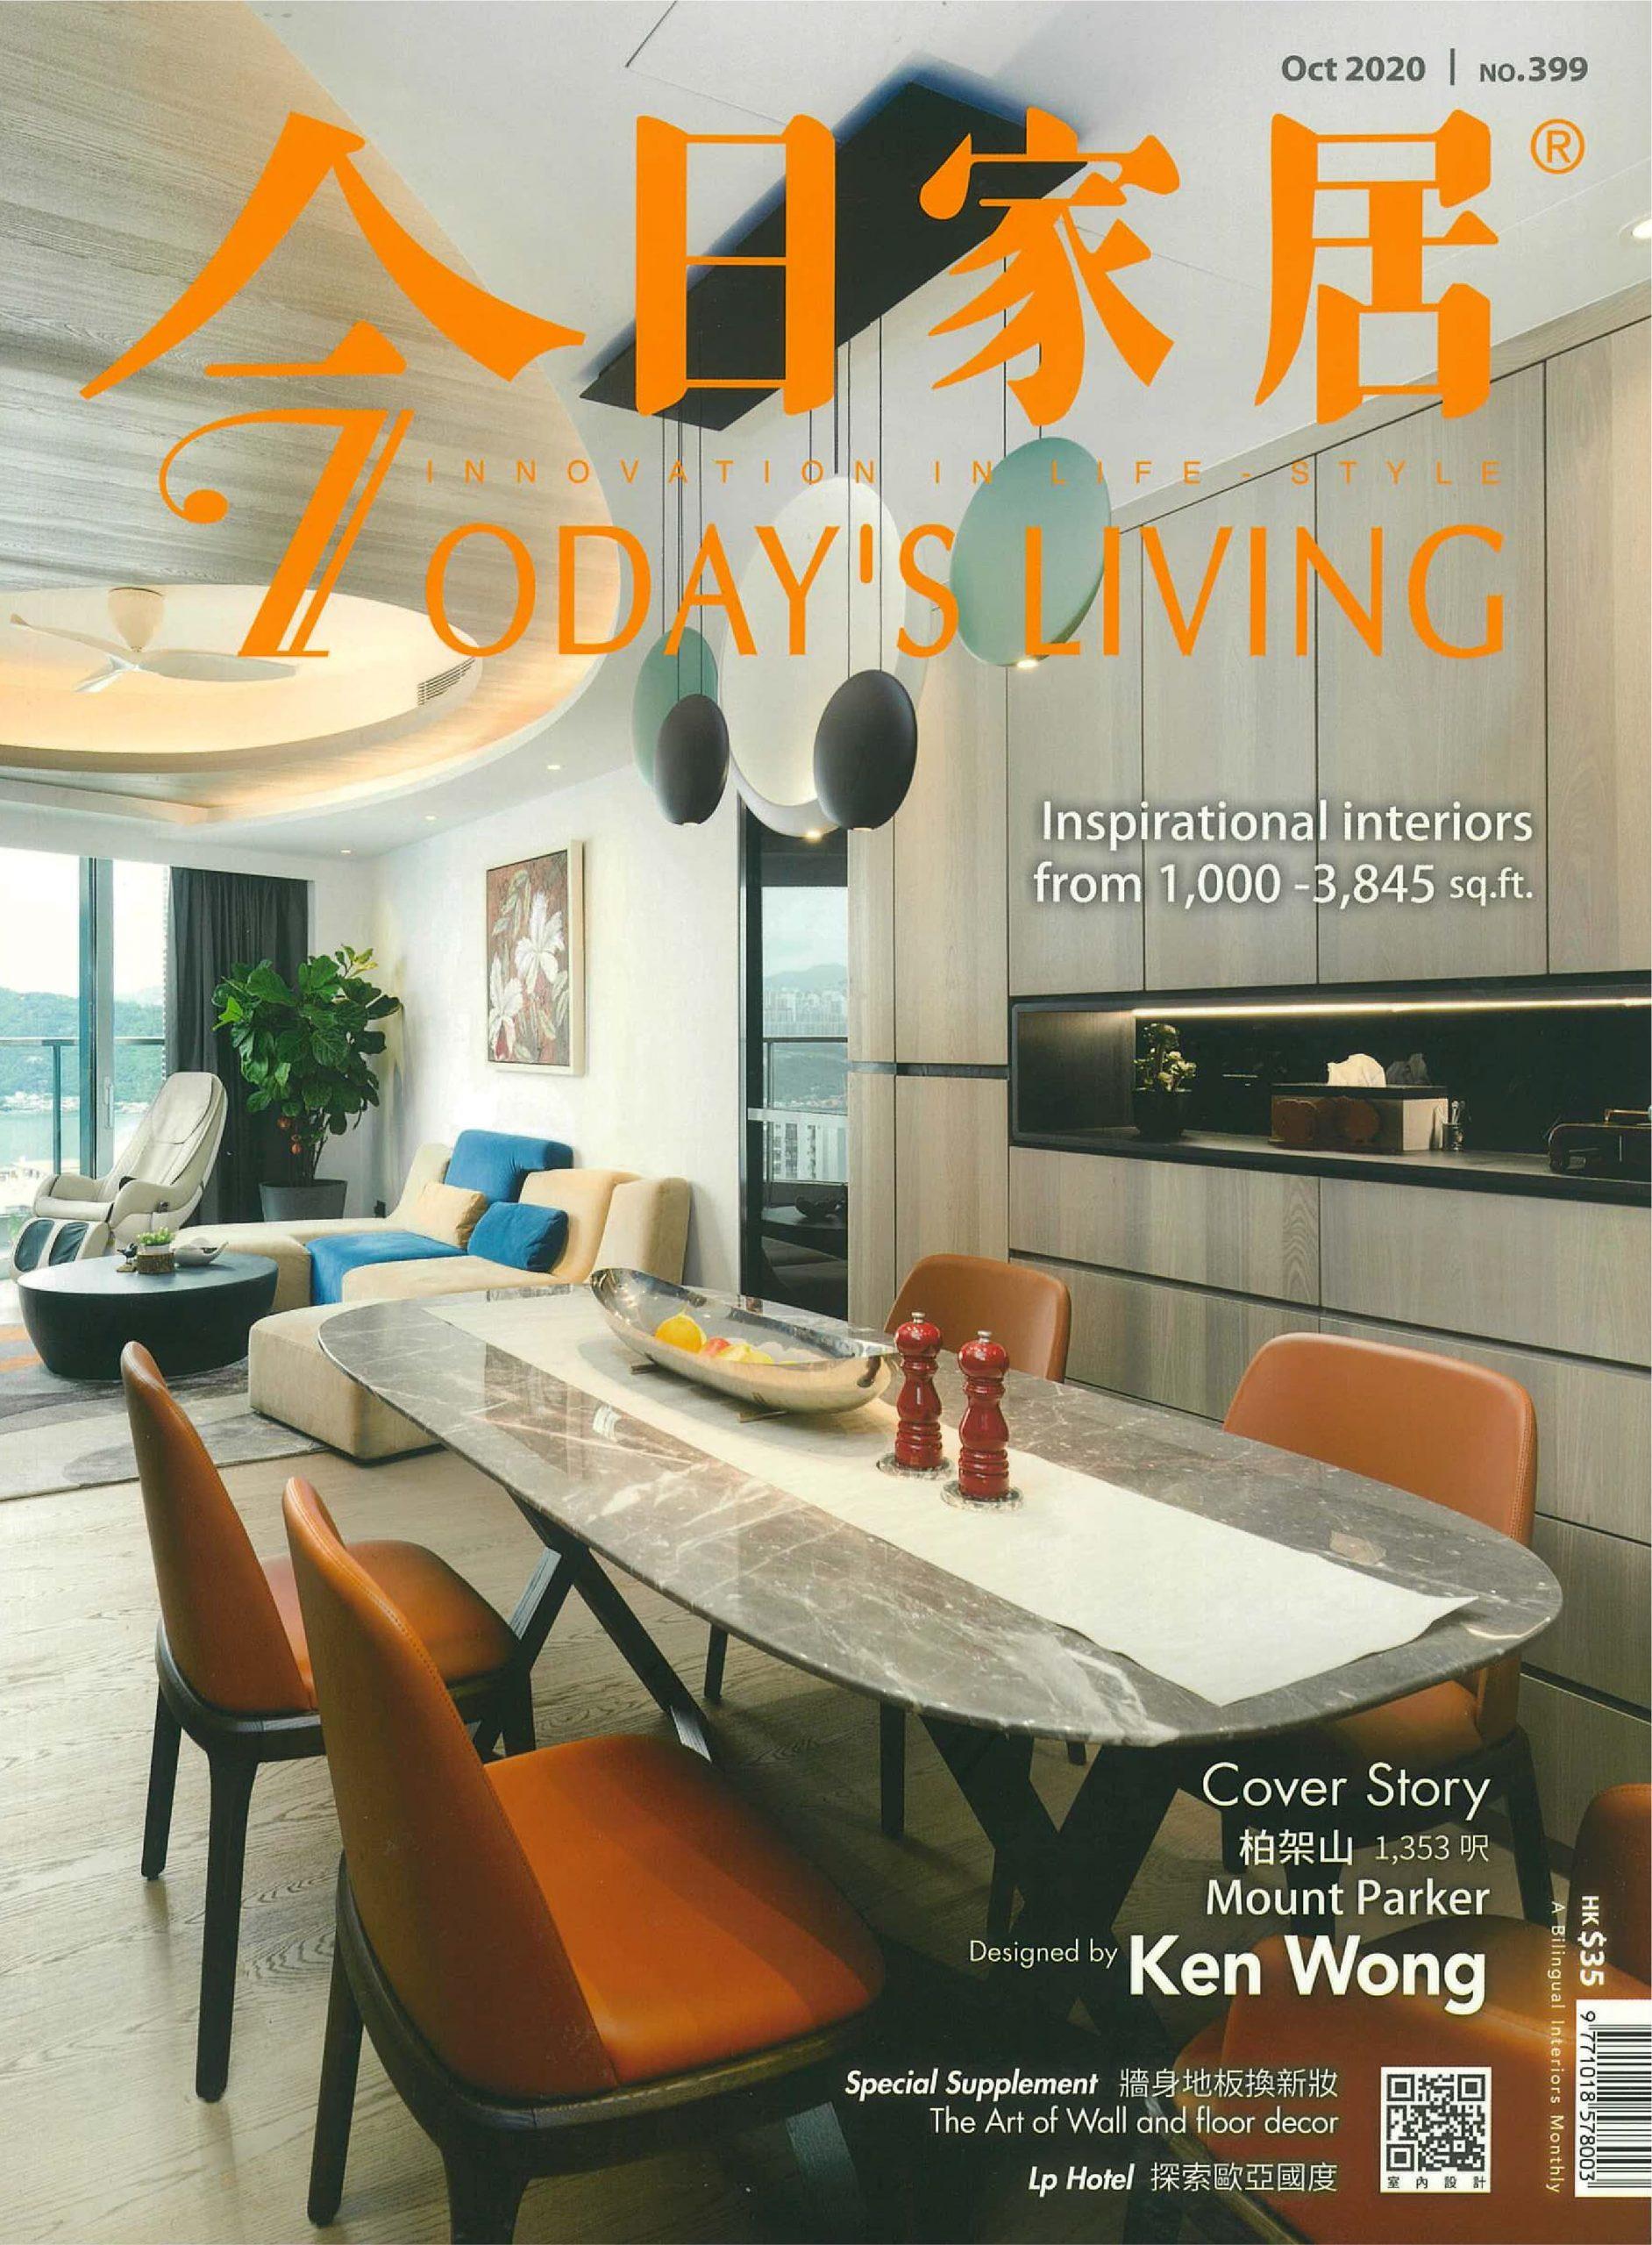 Tat Ming Flooring Inspirational interiors